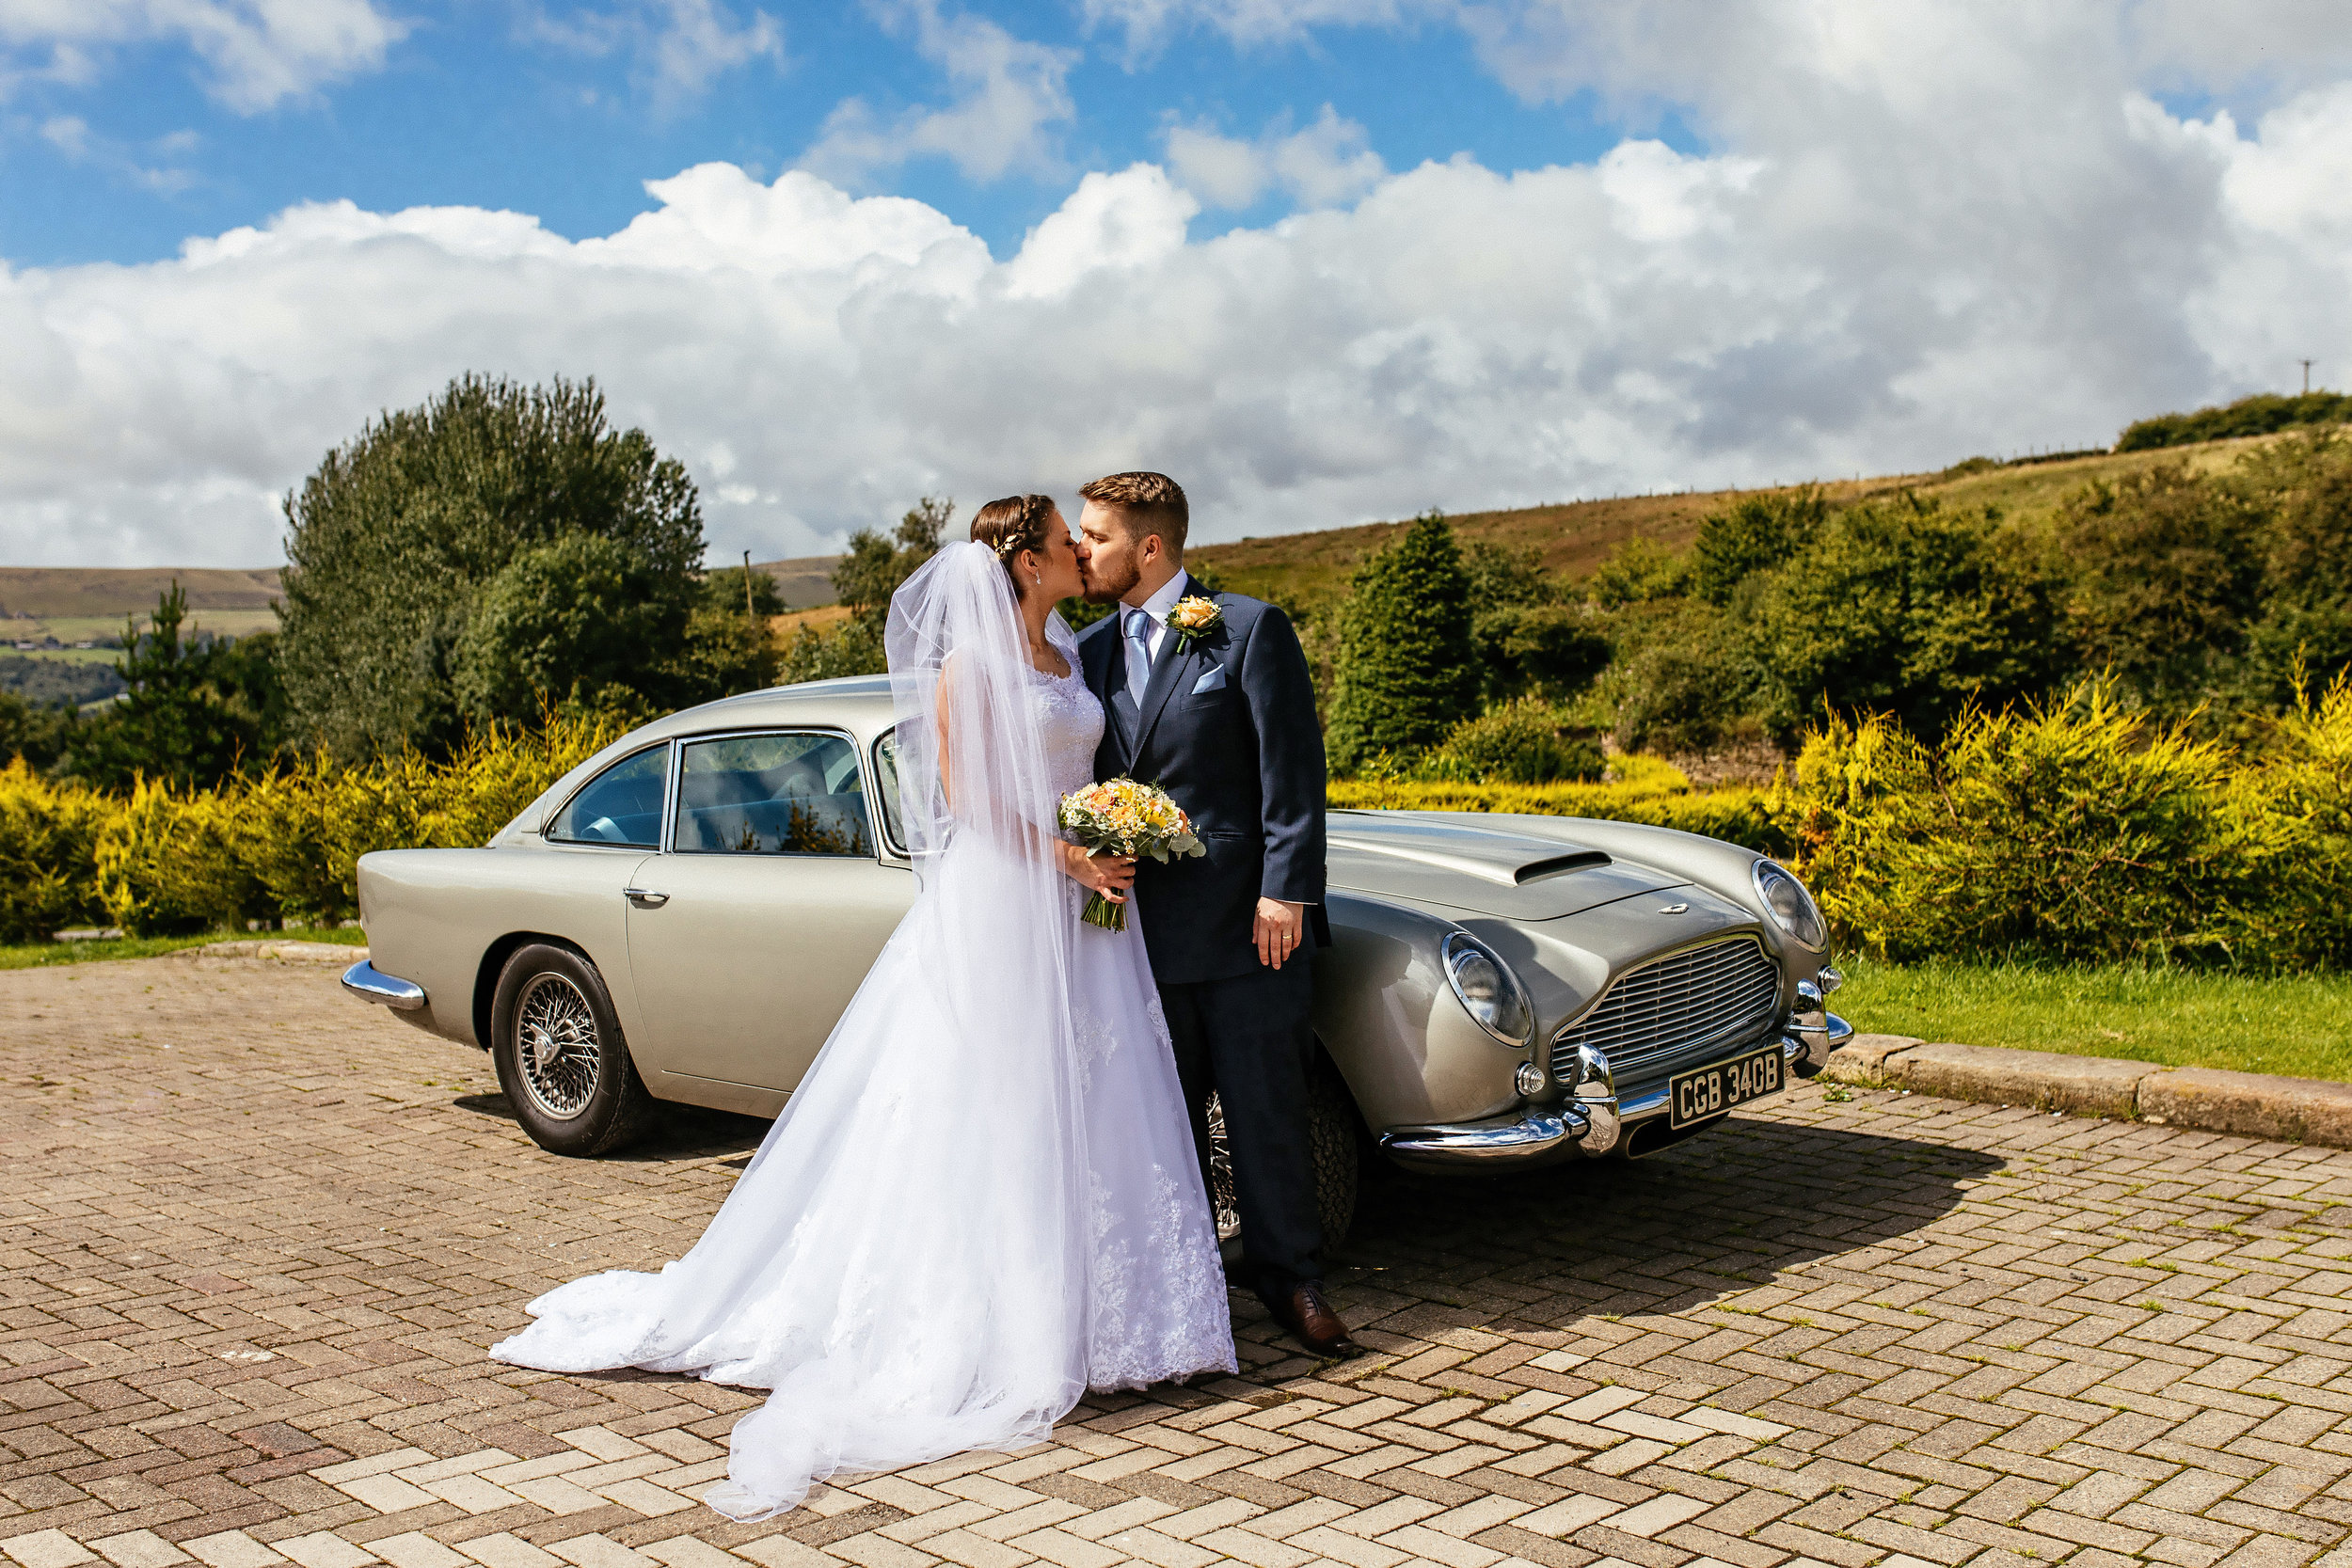 Kathryn-and-Mike-Wedding-Highlights-45.jpg